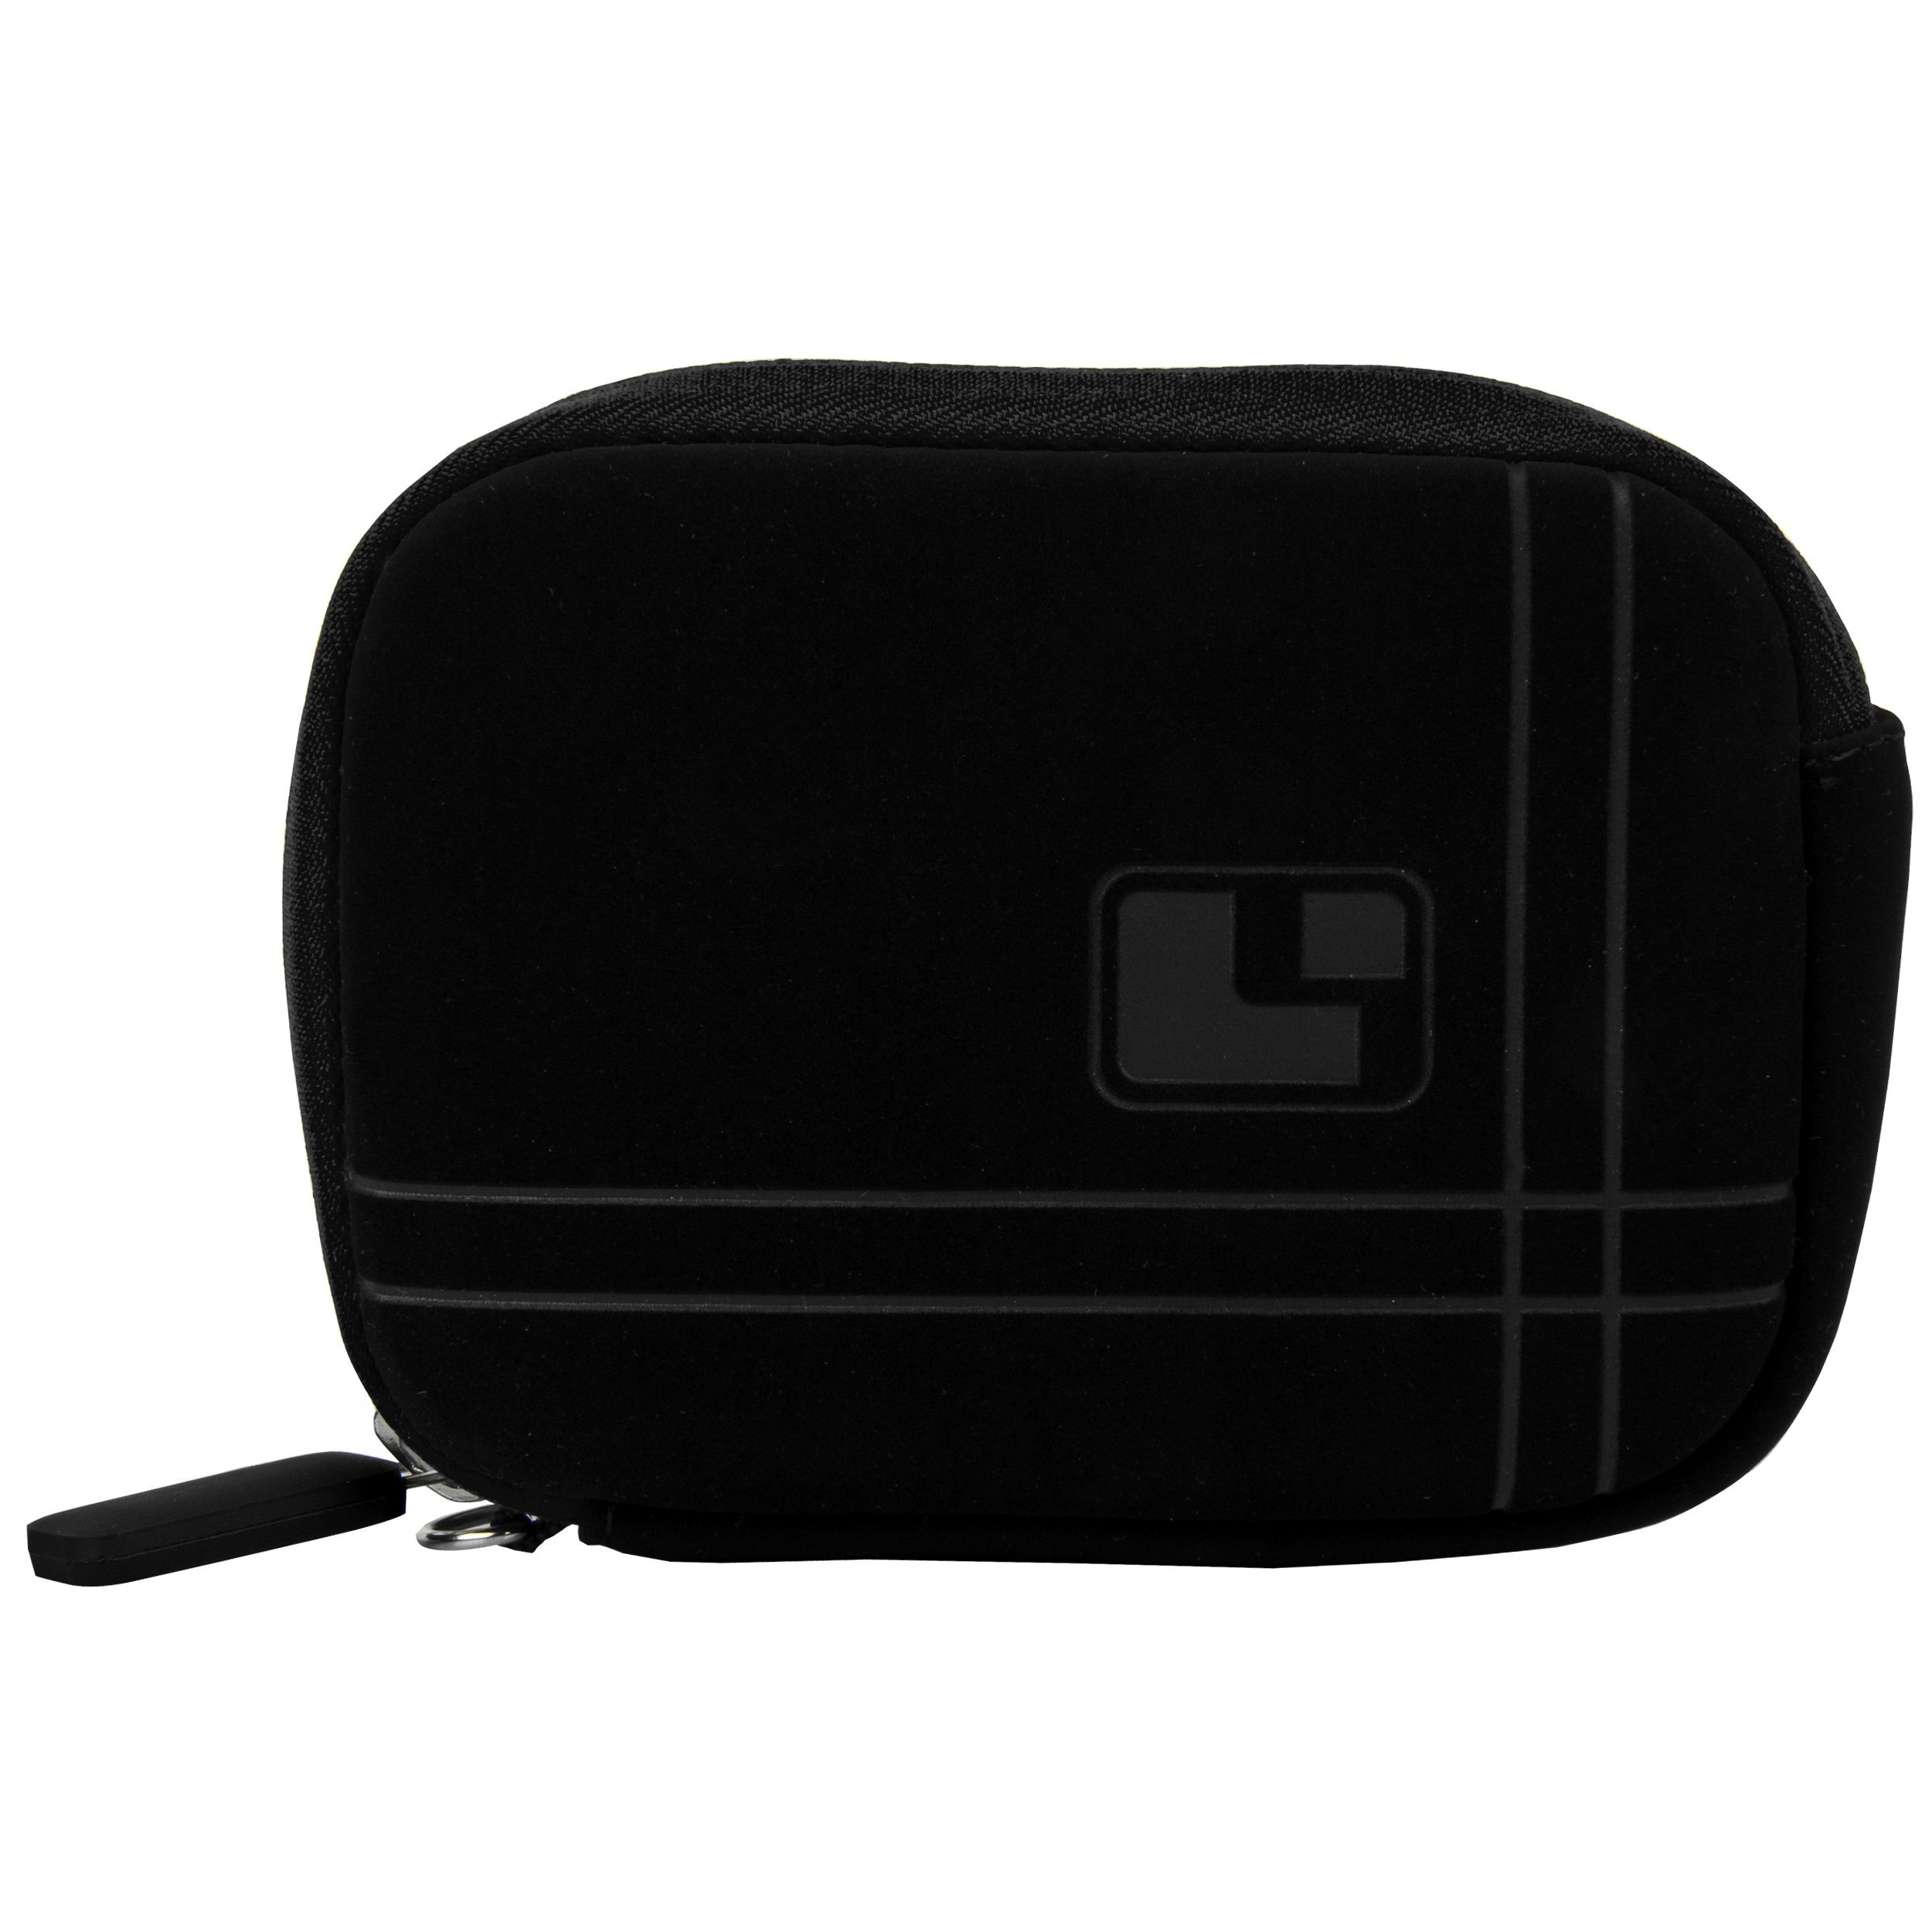 (Black) SumacLife Micro Suede Neo Bubble Camera Sleeve for Panasonic Lumix DMC-ZS30 (Lumix DMC-TZ40) Point & Shoot Digital Camera